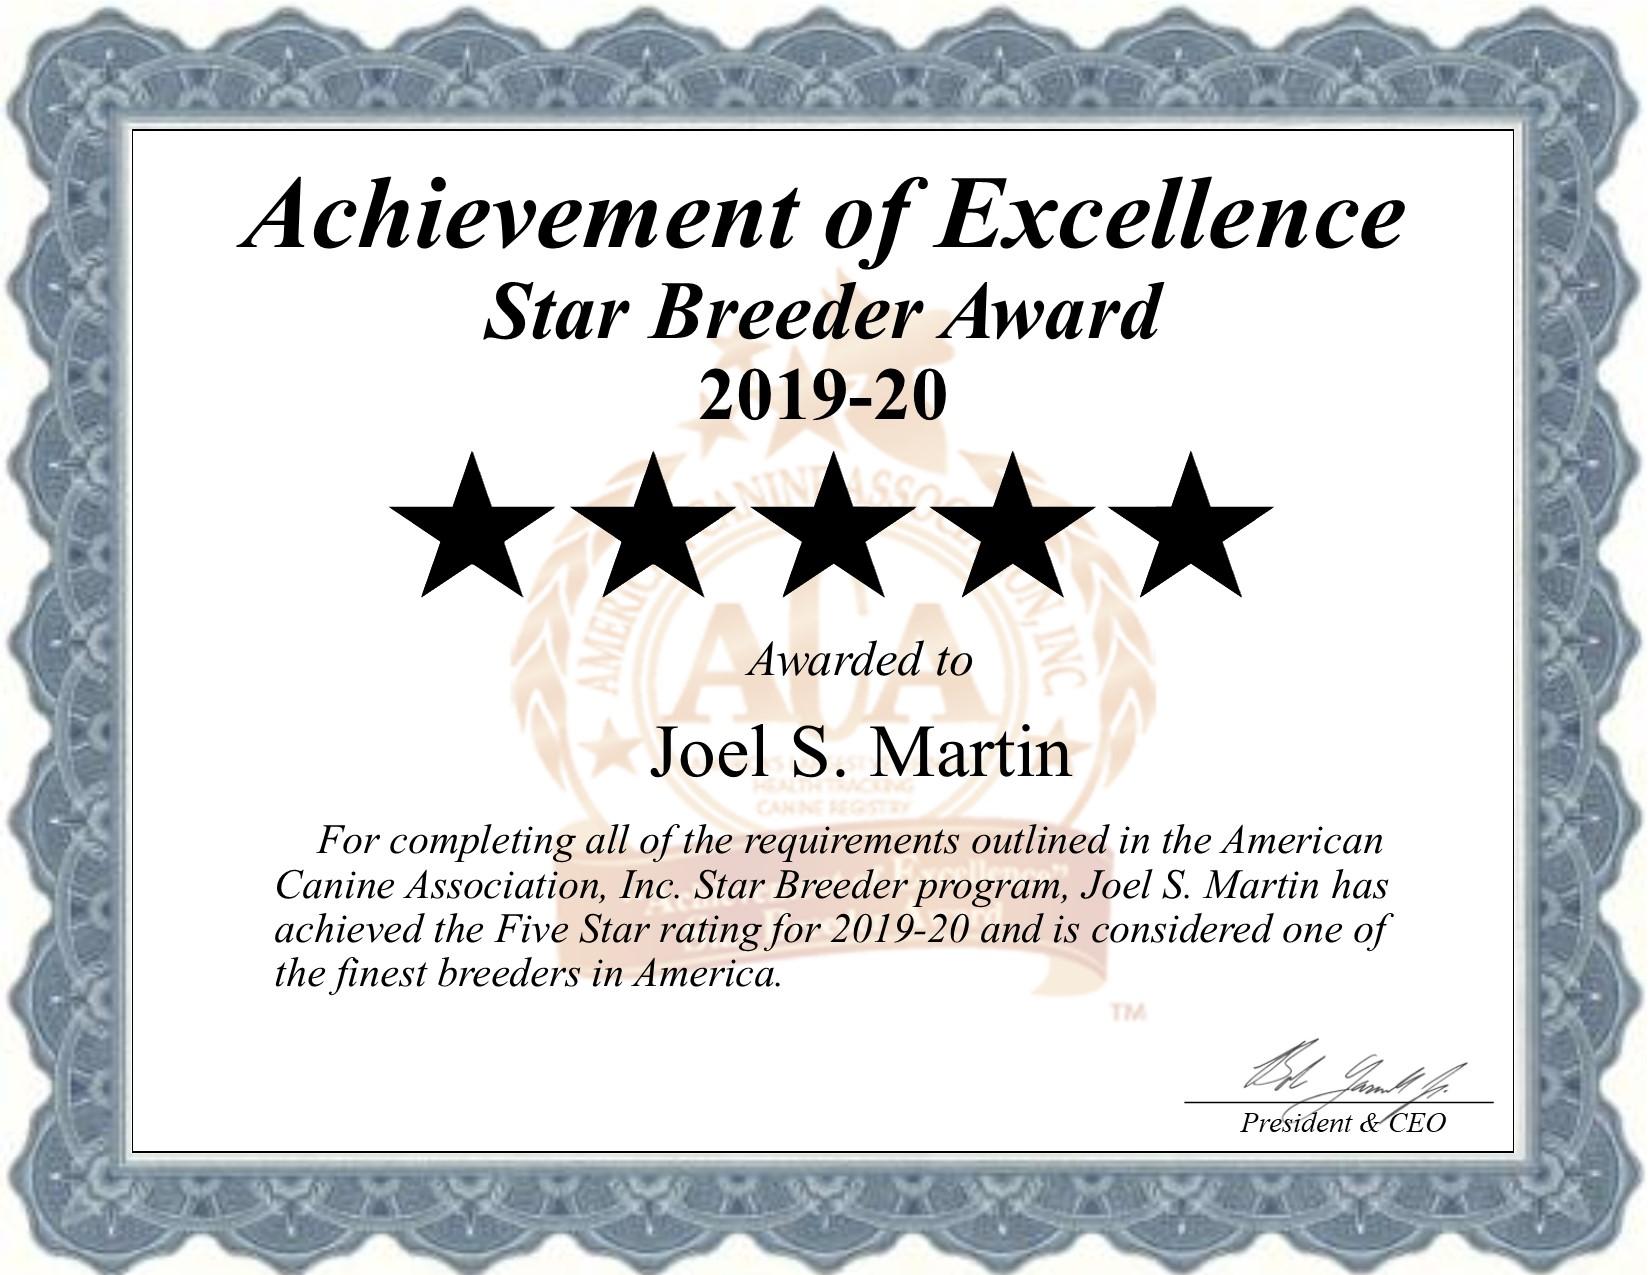 joel, s, martin, dog, breeder, certificate, el, dornado, springs, mo, missouri, joel-martin, dog-breeder, dogbreeder, kennel, reviews, customer, star, starbreeder, 5, five, USDA, puppy, puppies, ACA, inspection, inspections, reports, mill, puppymill, mills